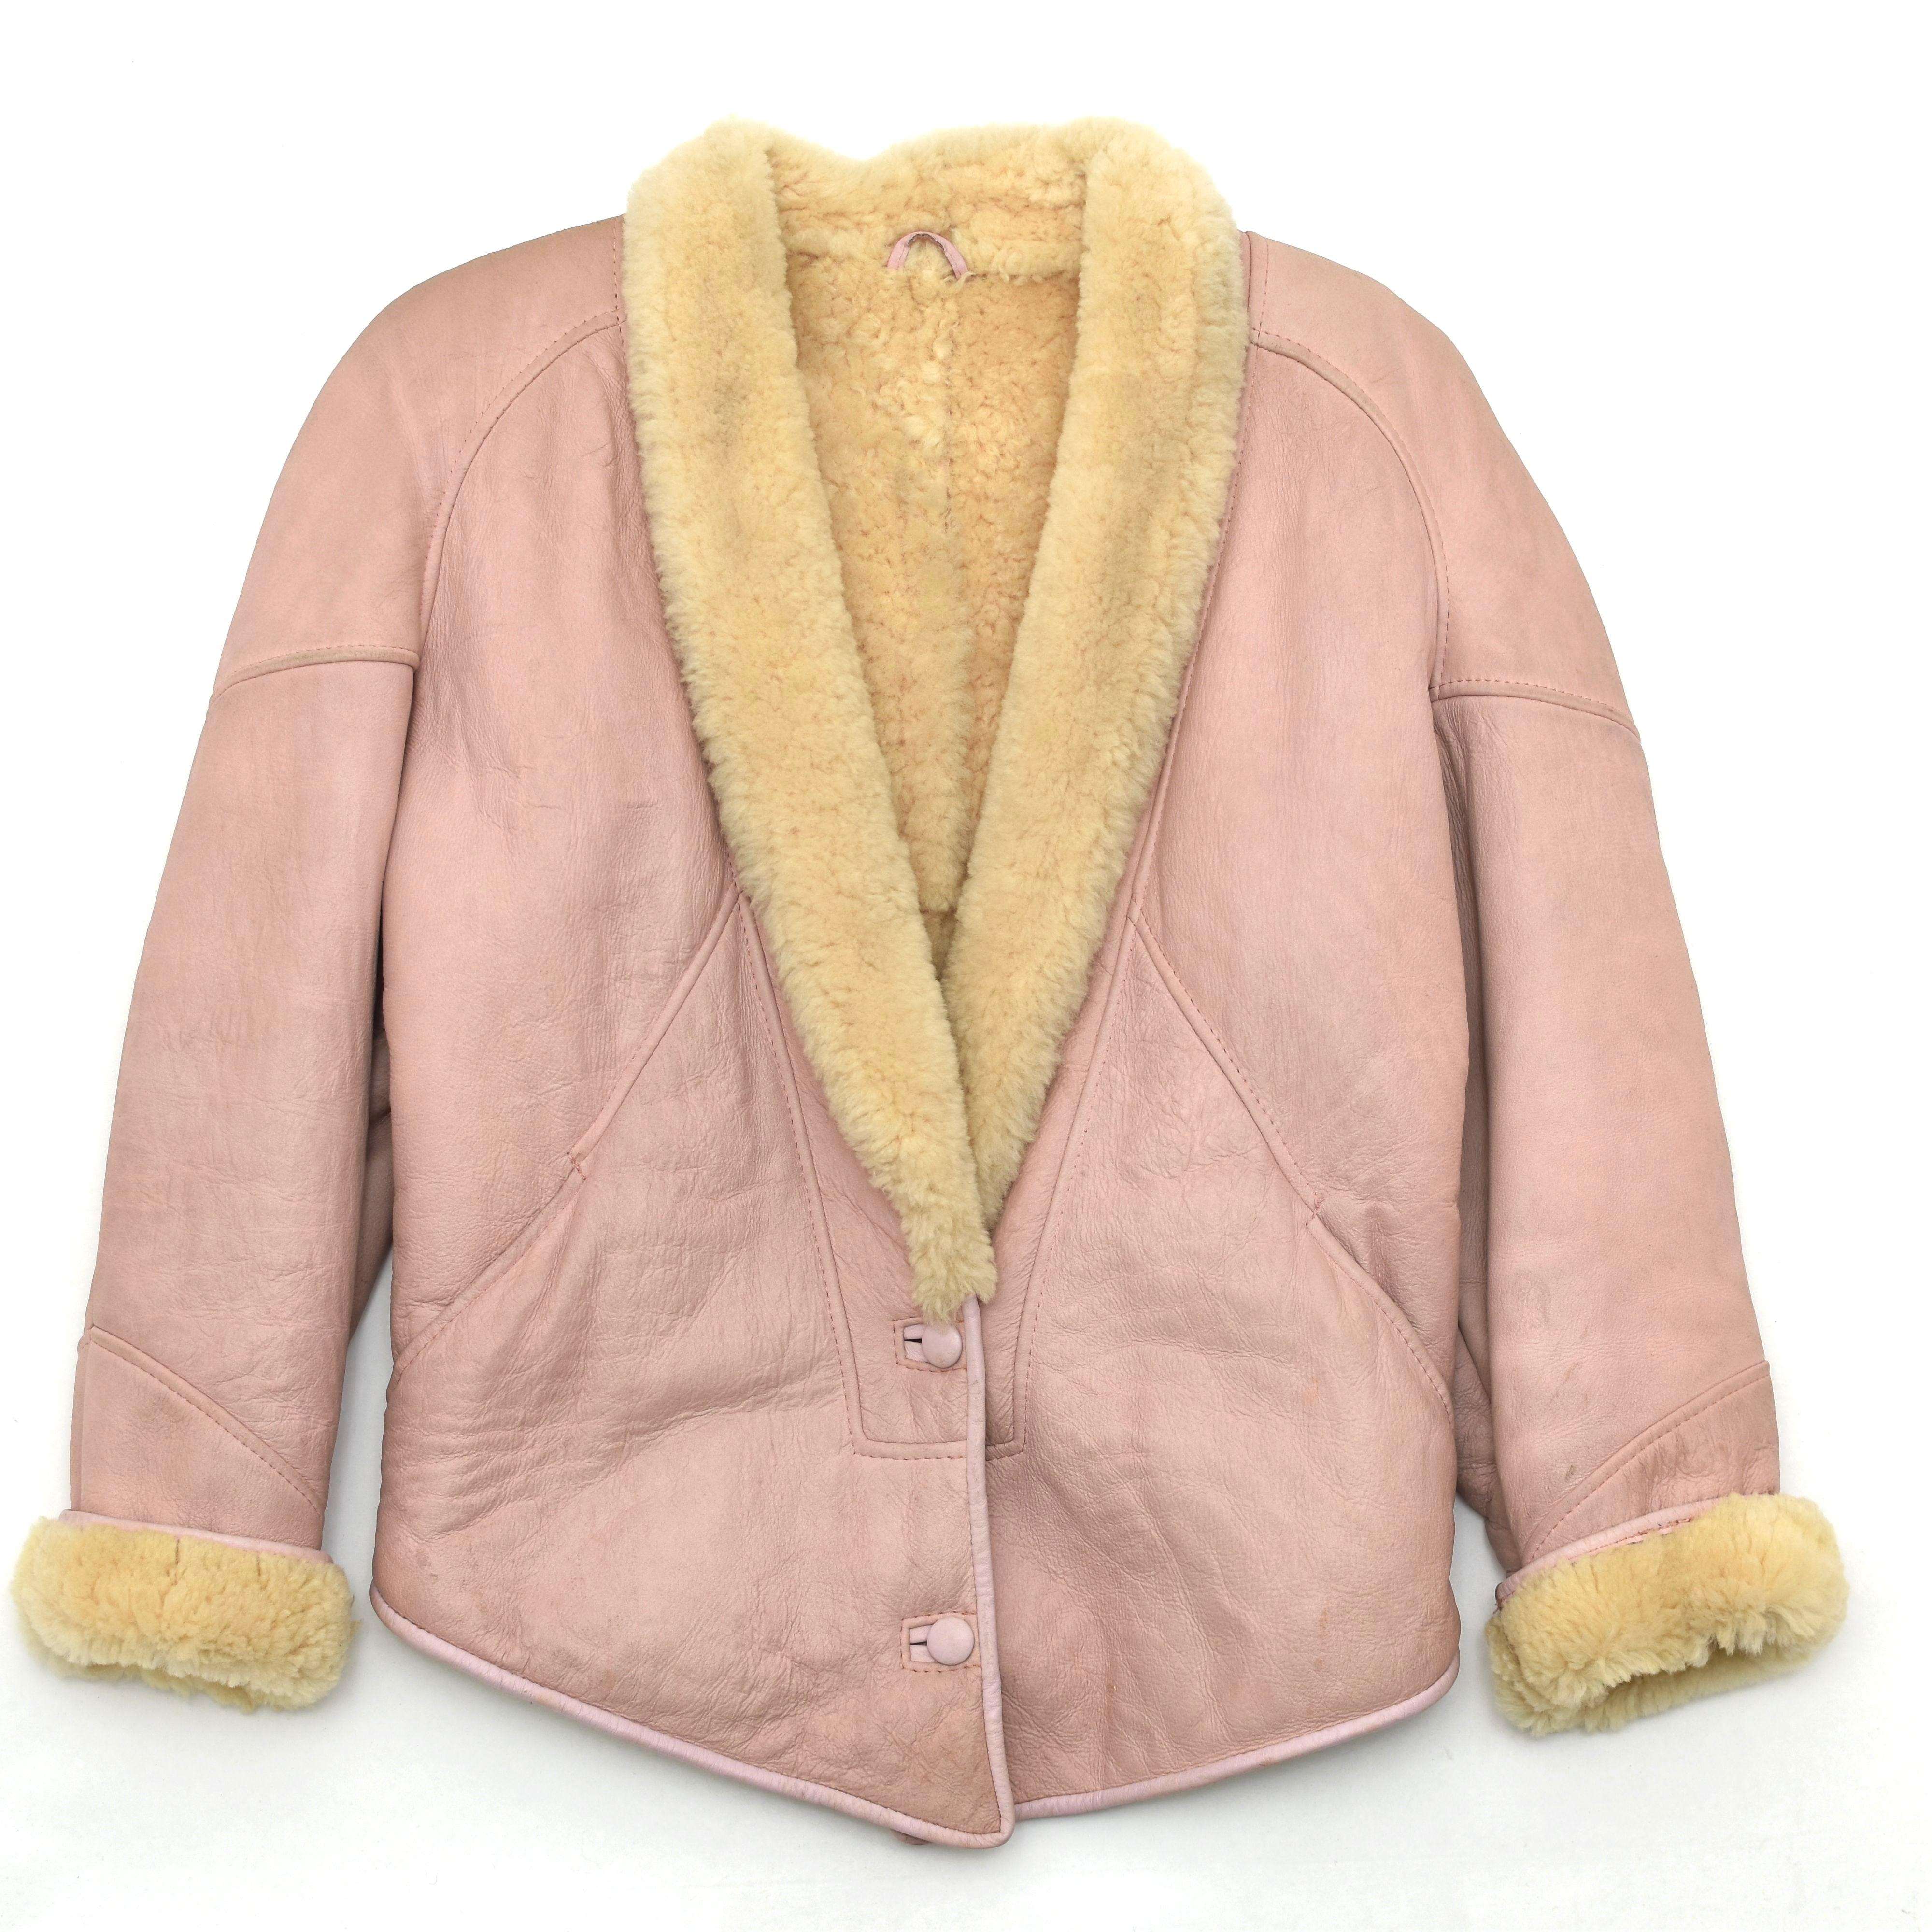 Vintage Mouton Leather Boa Jacket